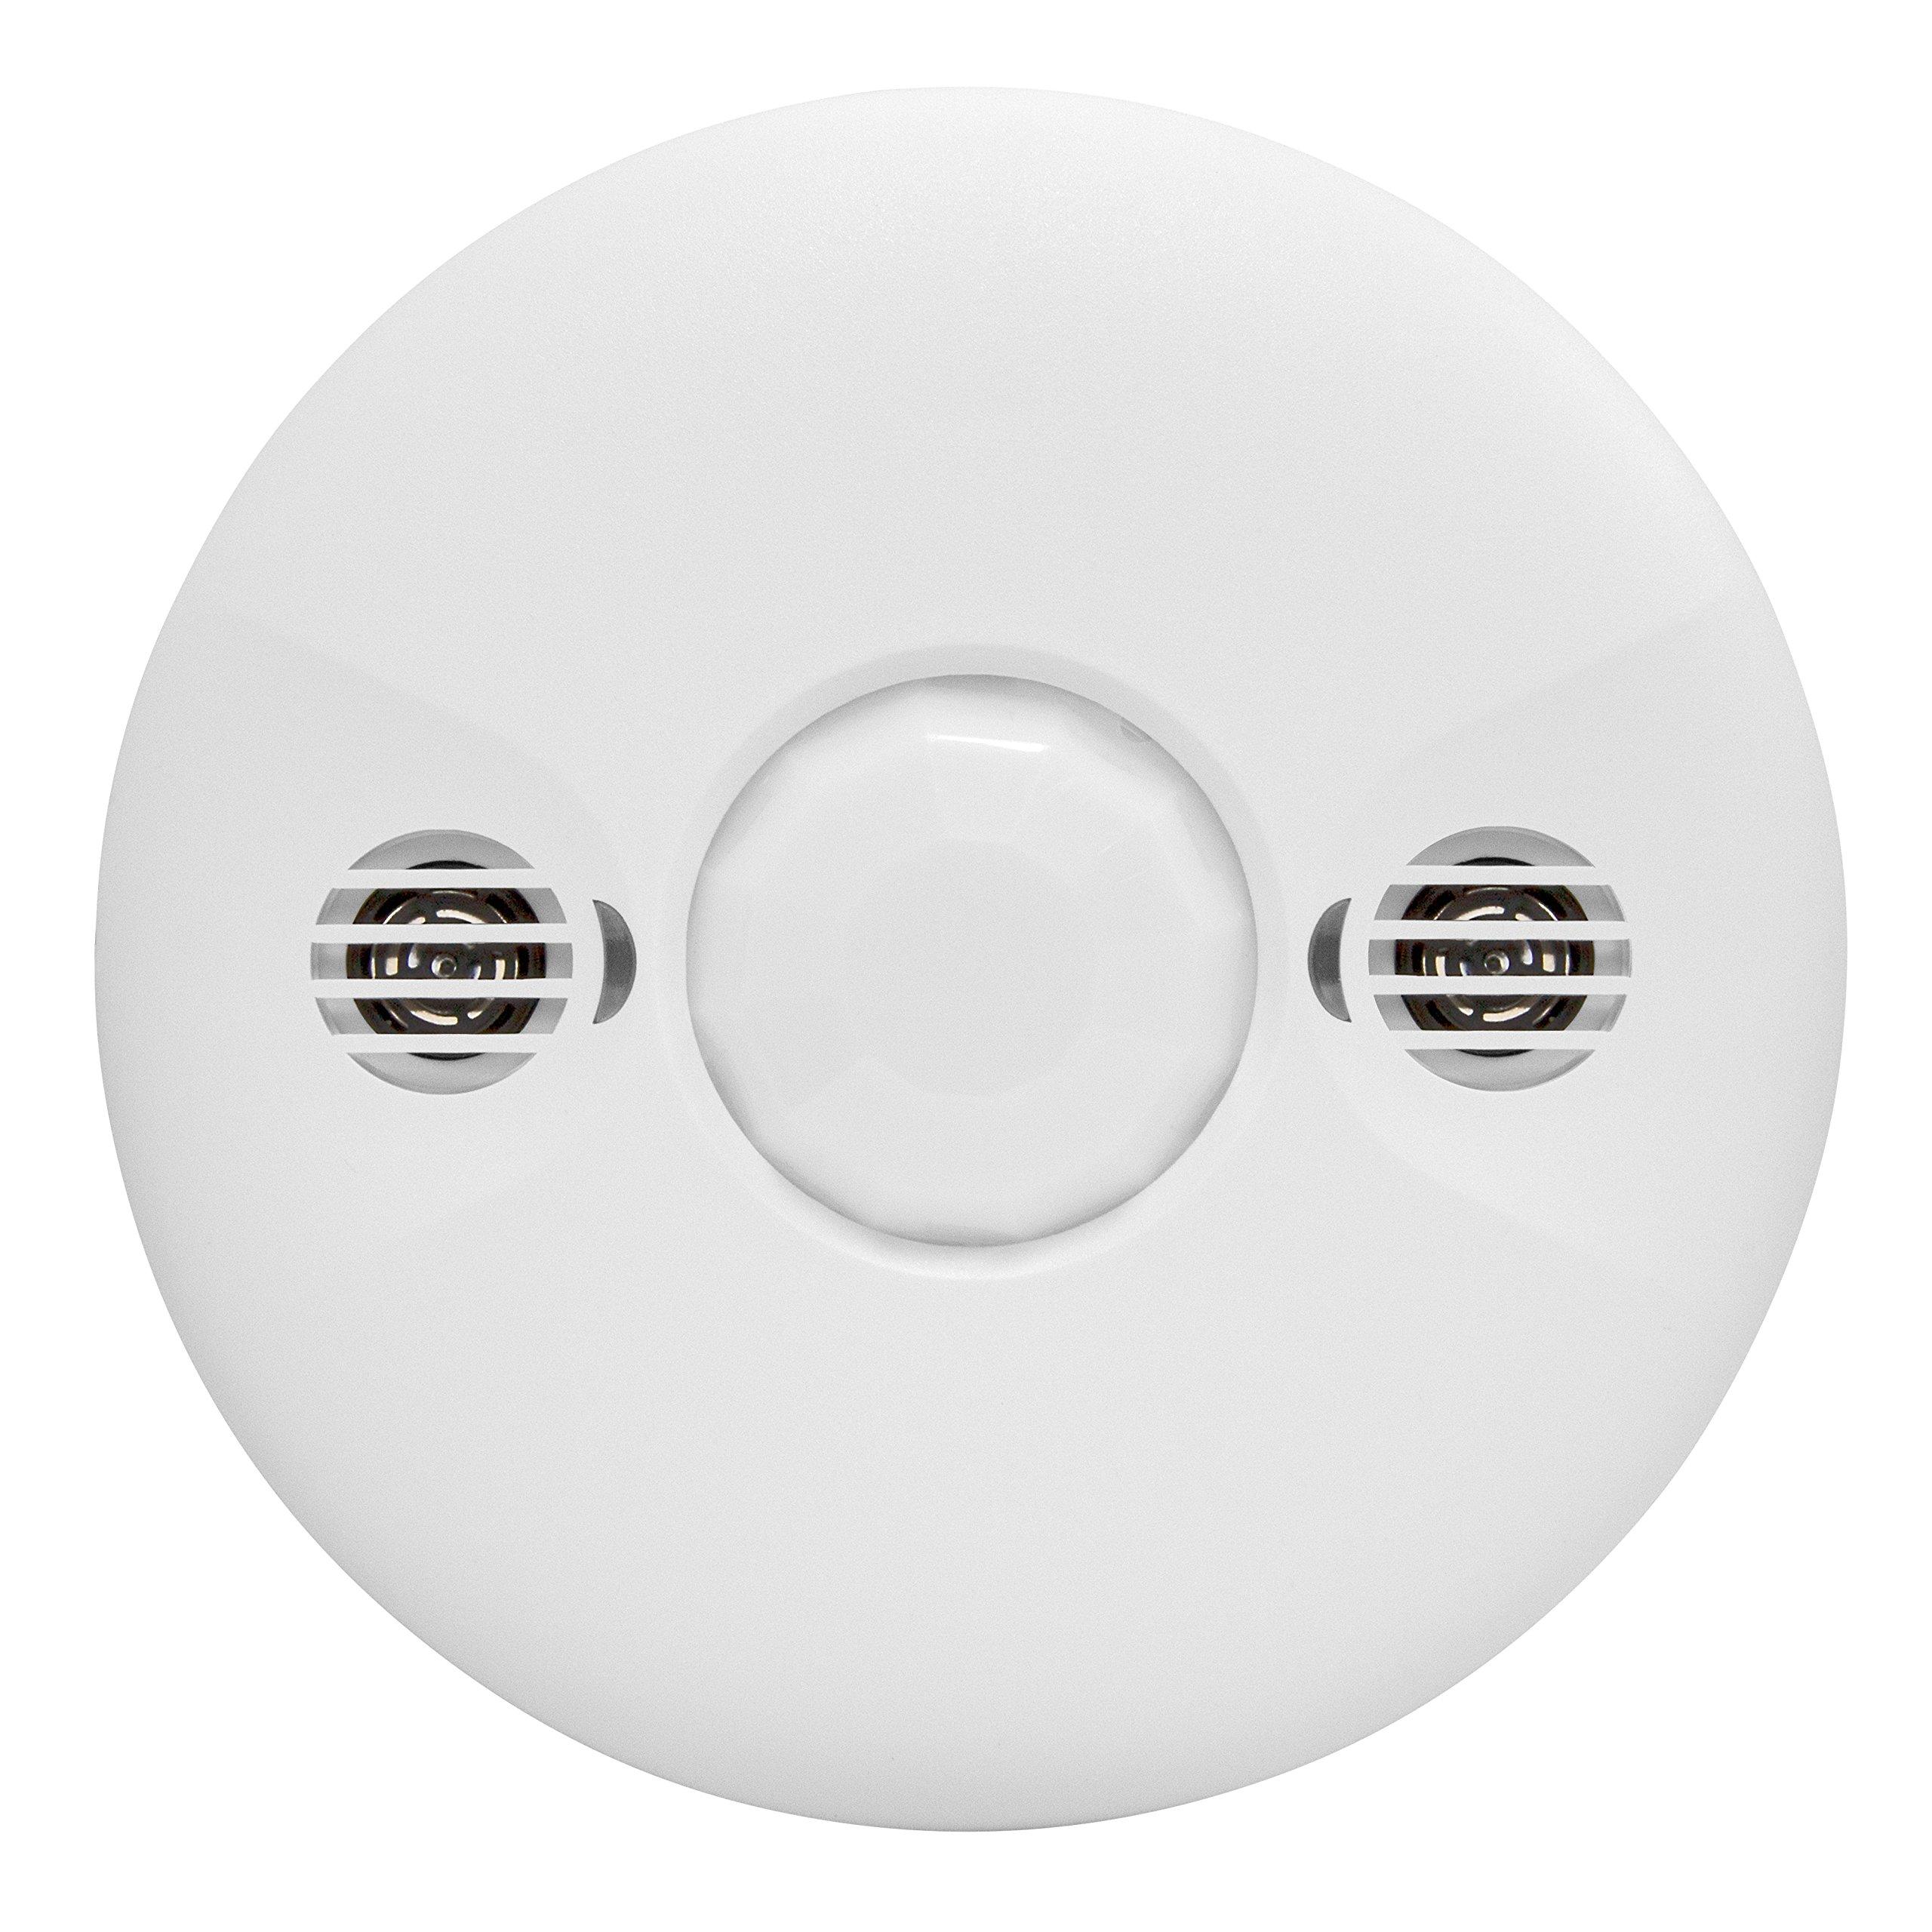 Enerlites MDC-50L Ceiling Sensor Commercial Grade Ultrasonic/Passive Infrared 360 Degree FOV, Low Voltage, White